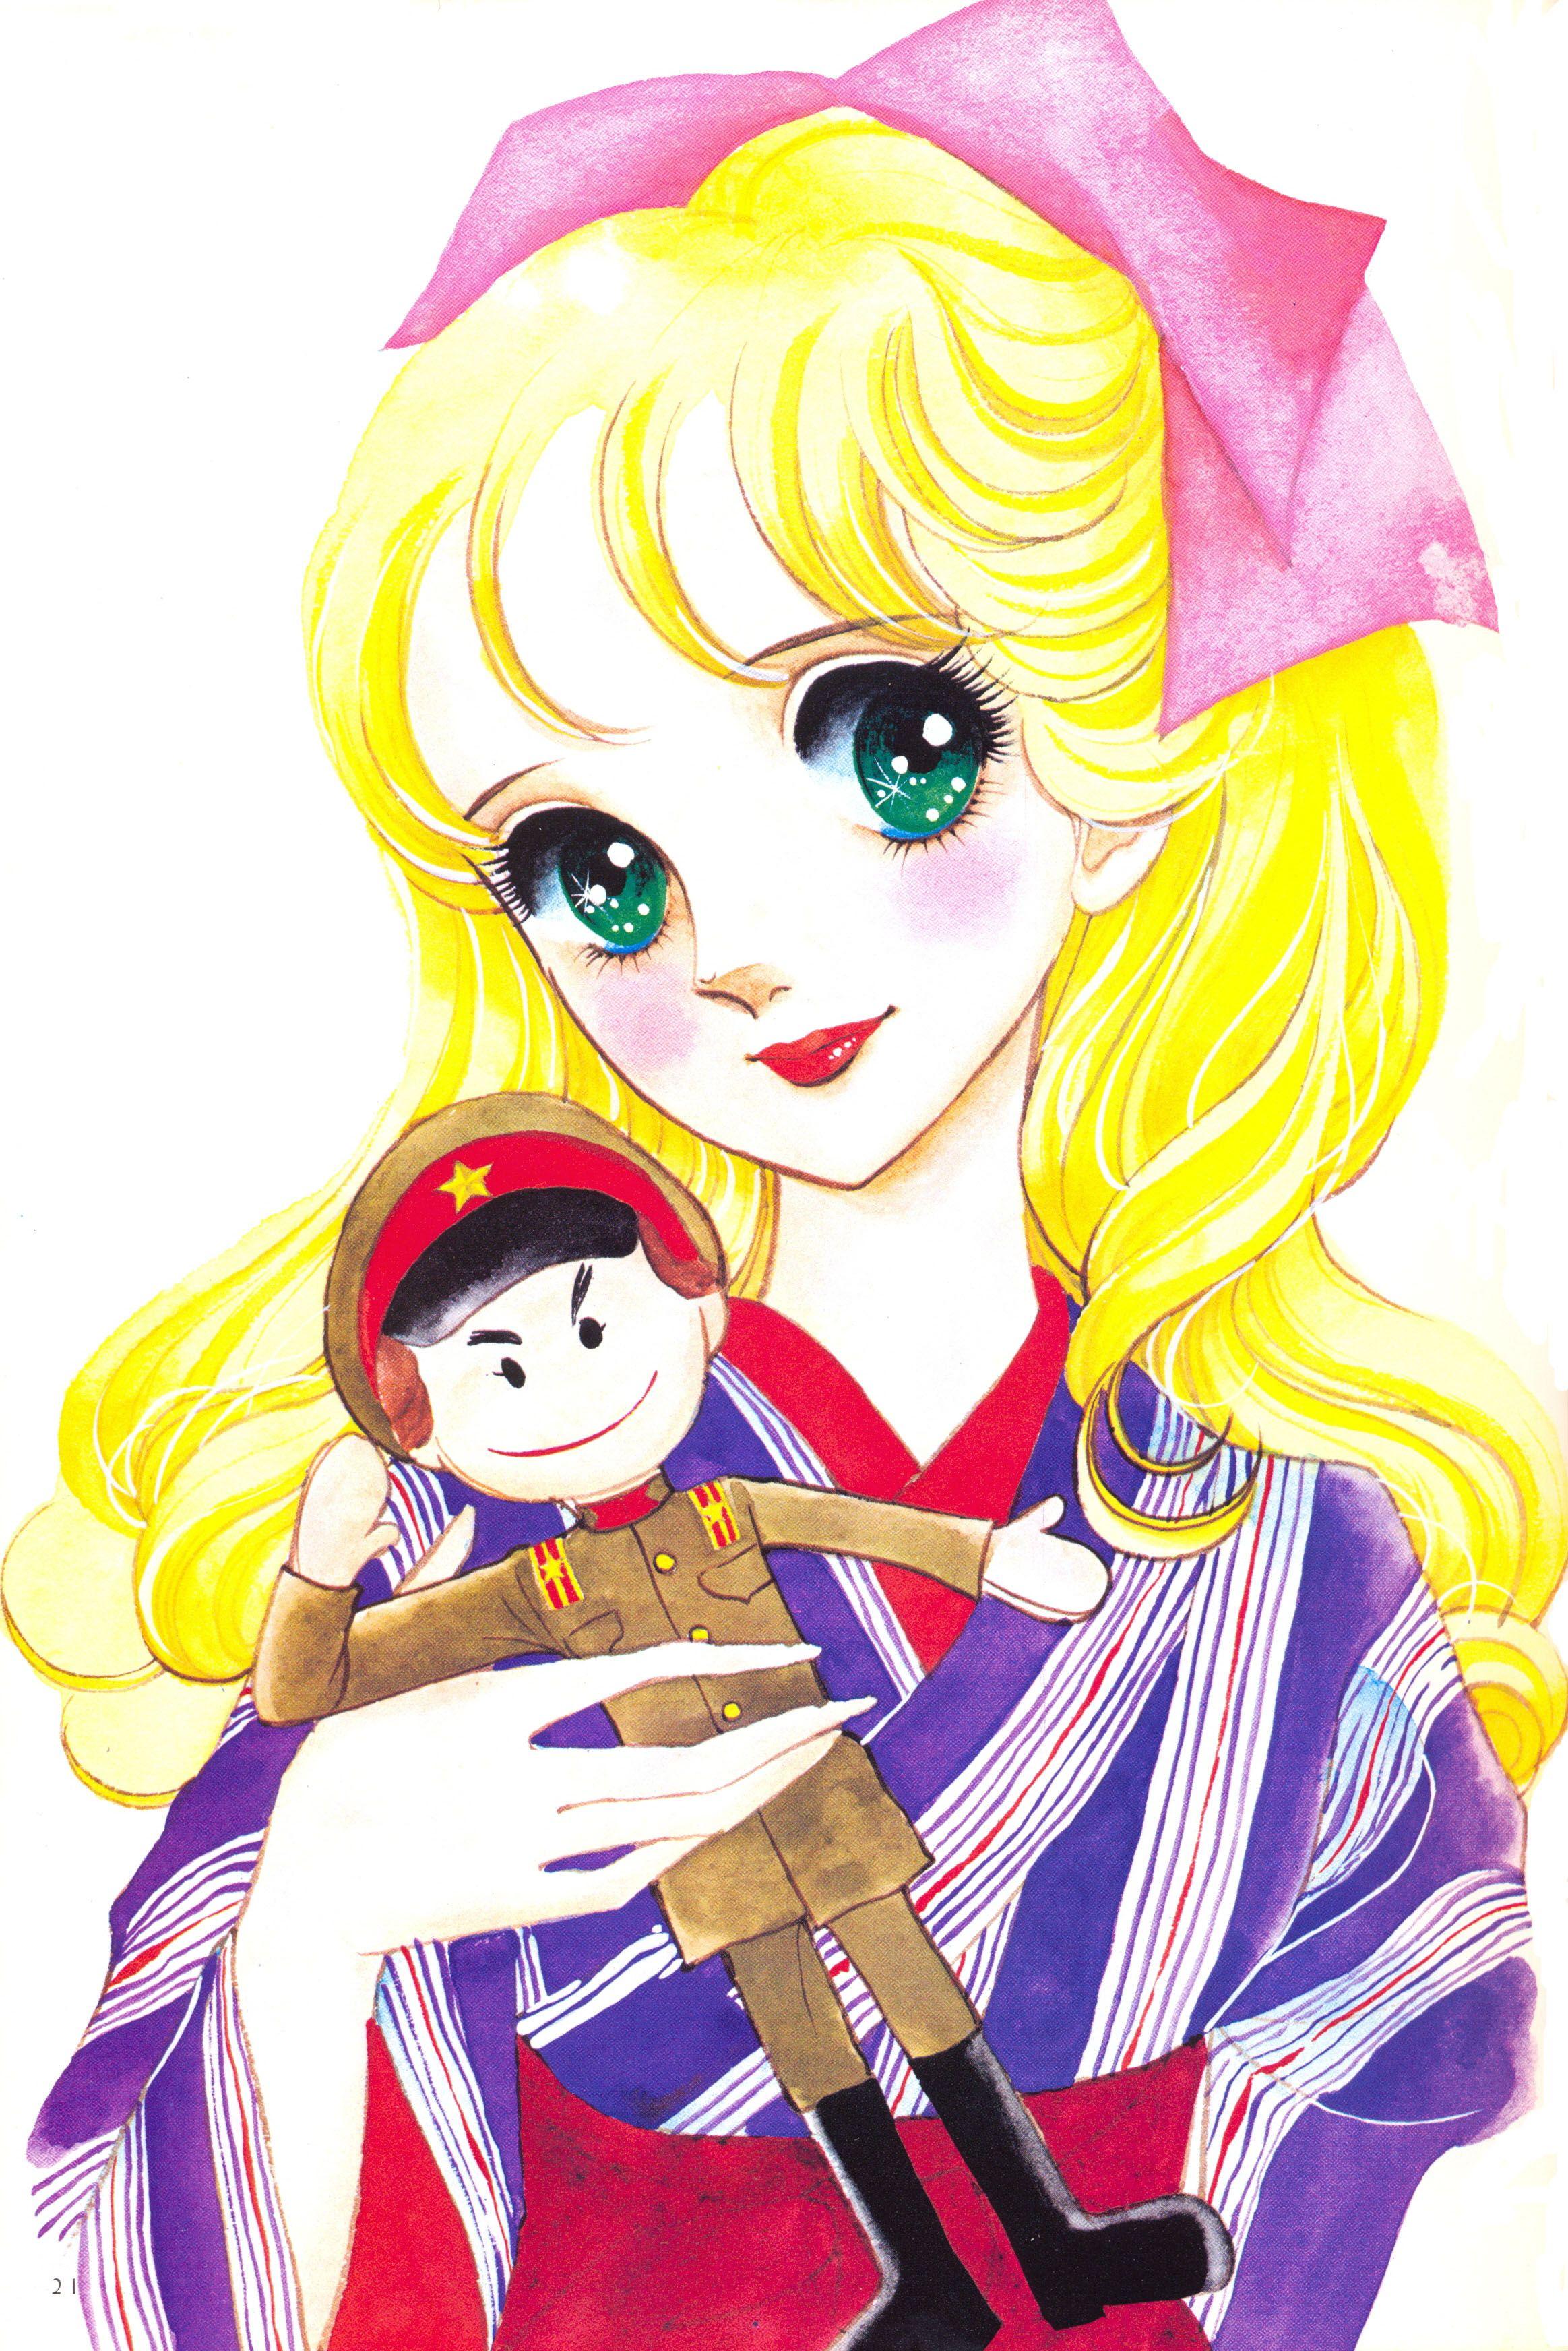 Haikara san ga tōru cute drawings shojo manga shoujo manga anime